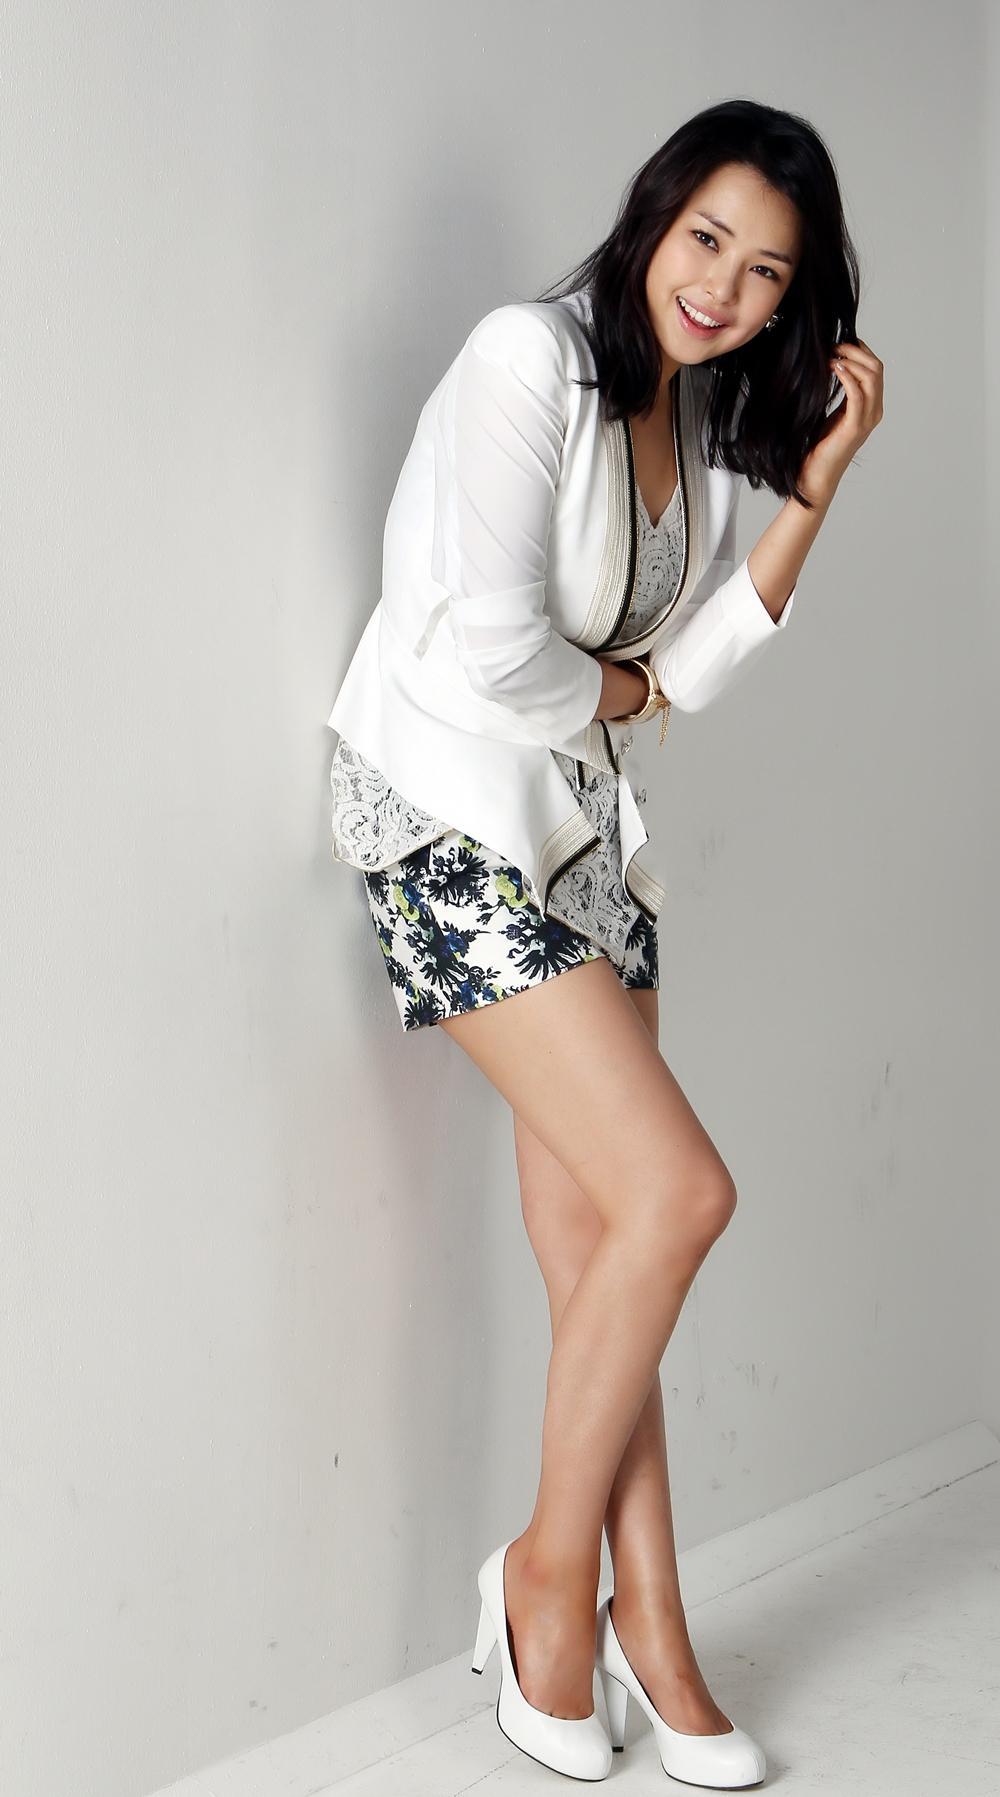 Lee Ha-nui sexy legs pics